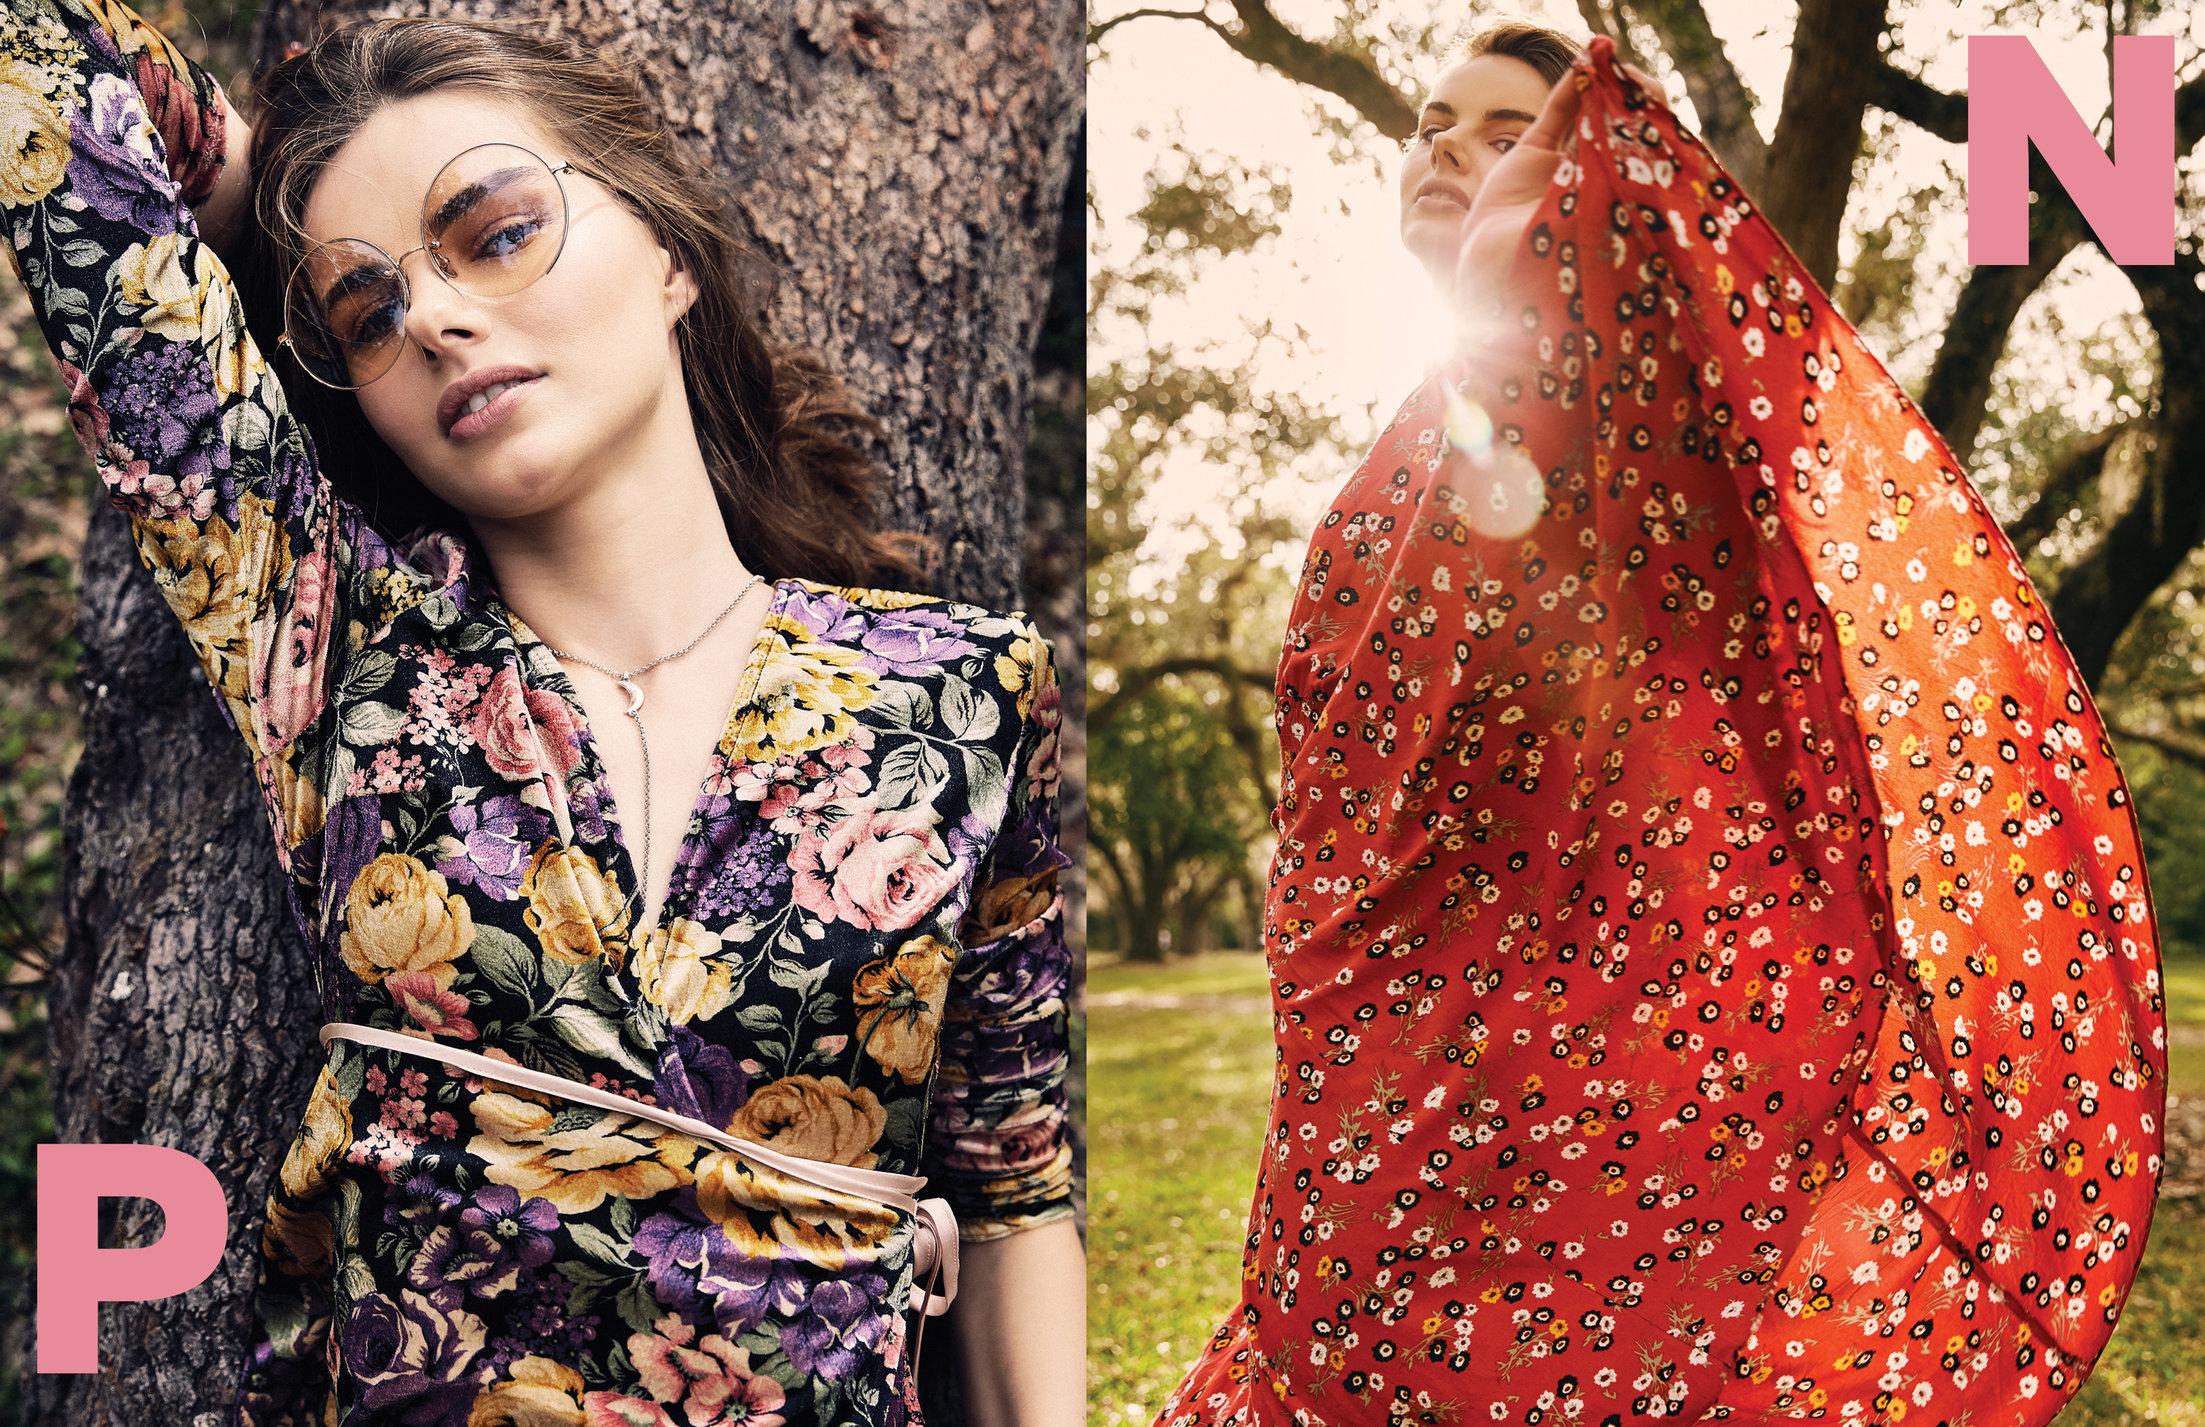 11-fashion-photographer-nico-stipcianos-miami-copy-6.jpg